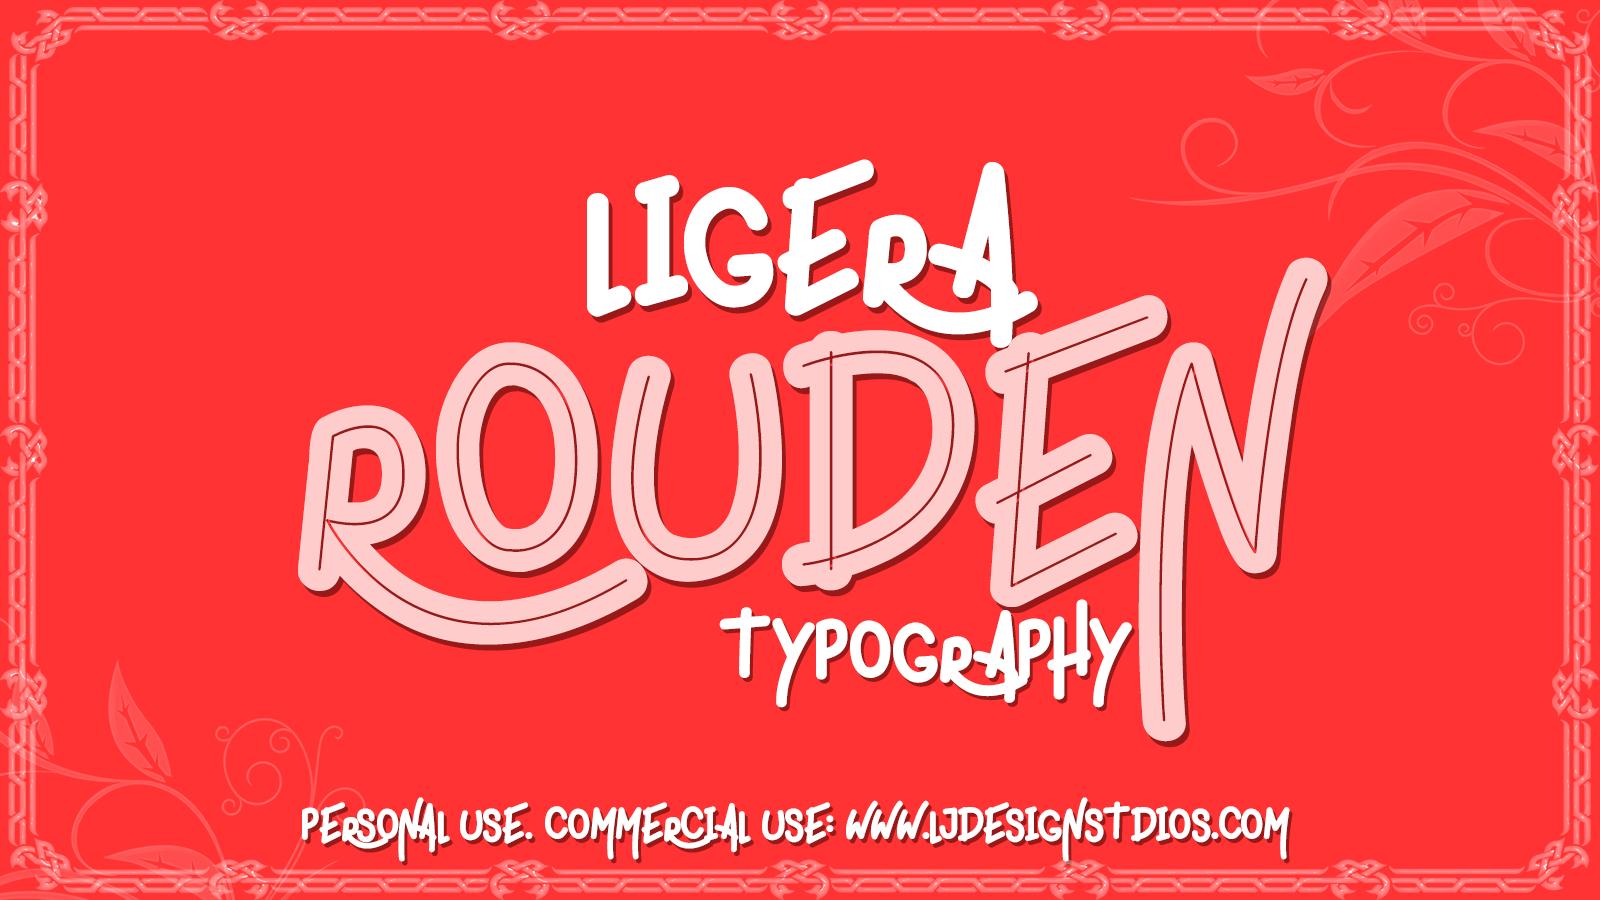 Ligera Rouden example image 1